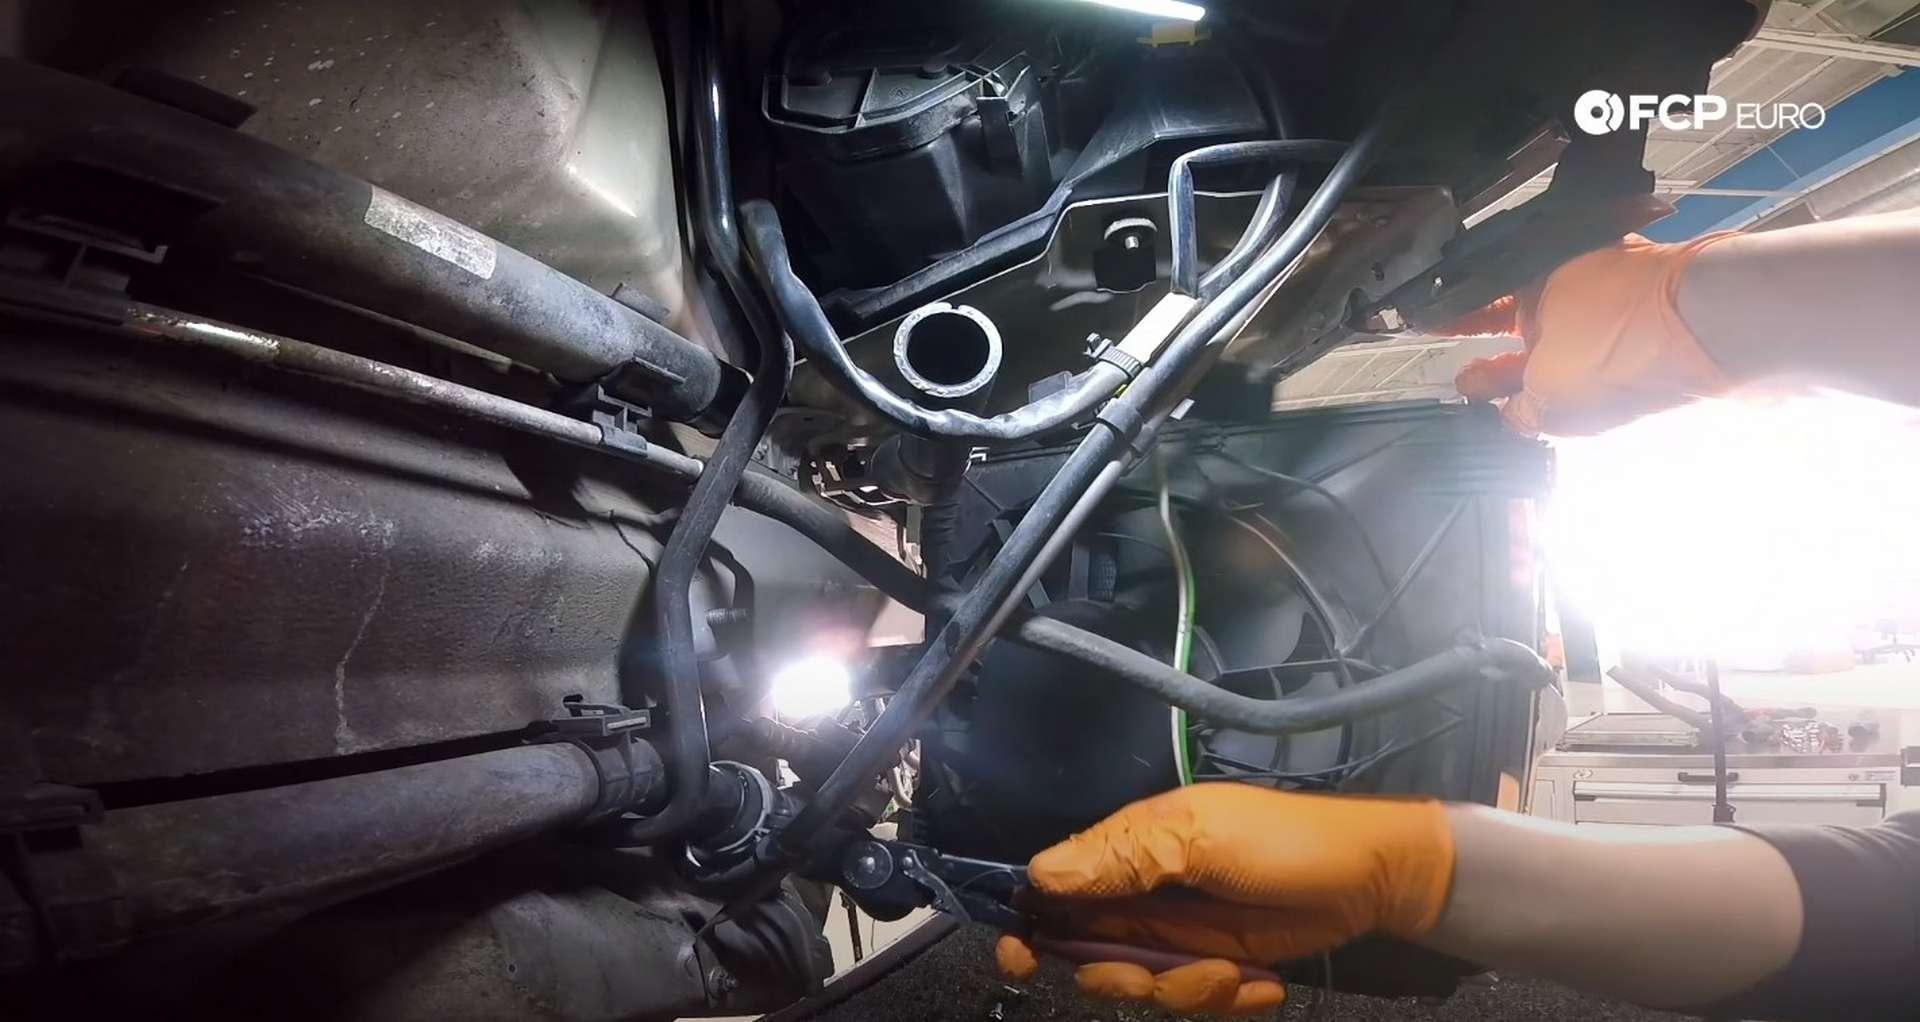 DIY Porsche 996 Radiator Replacement installing the new radiator